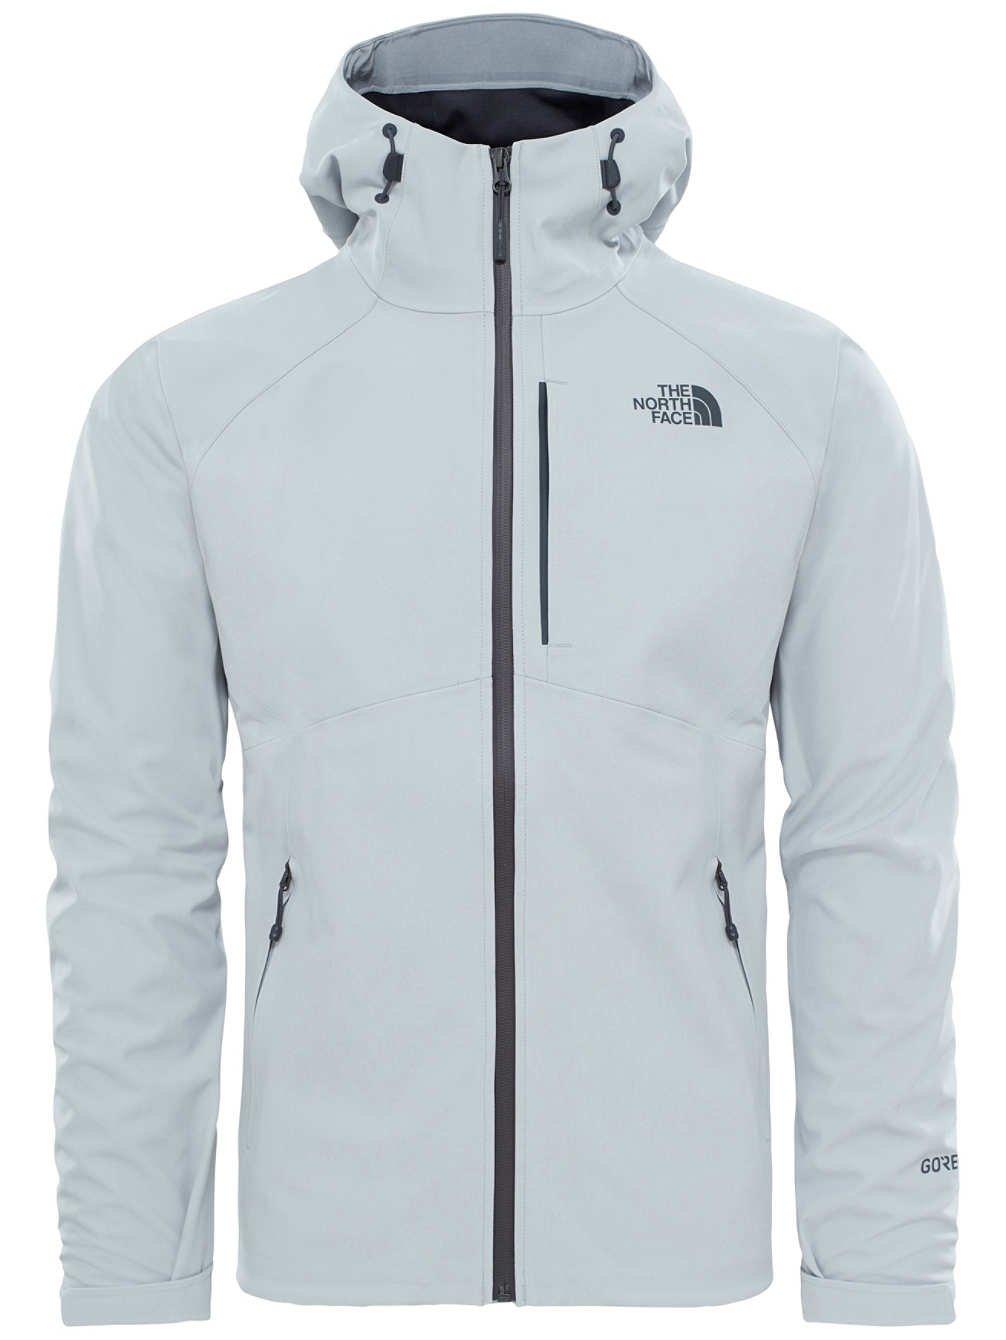 91d8d2a0753a Outdoor Jacket Men THE NORTH FACE Apex Flex Gore-Tex Outdoor Jacket   Amazon.co.uk  Clothing